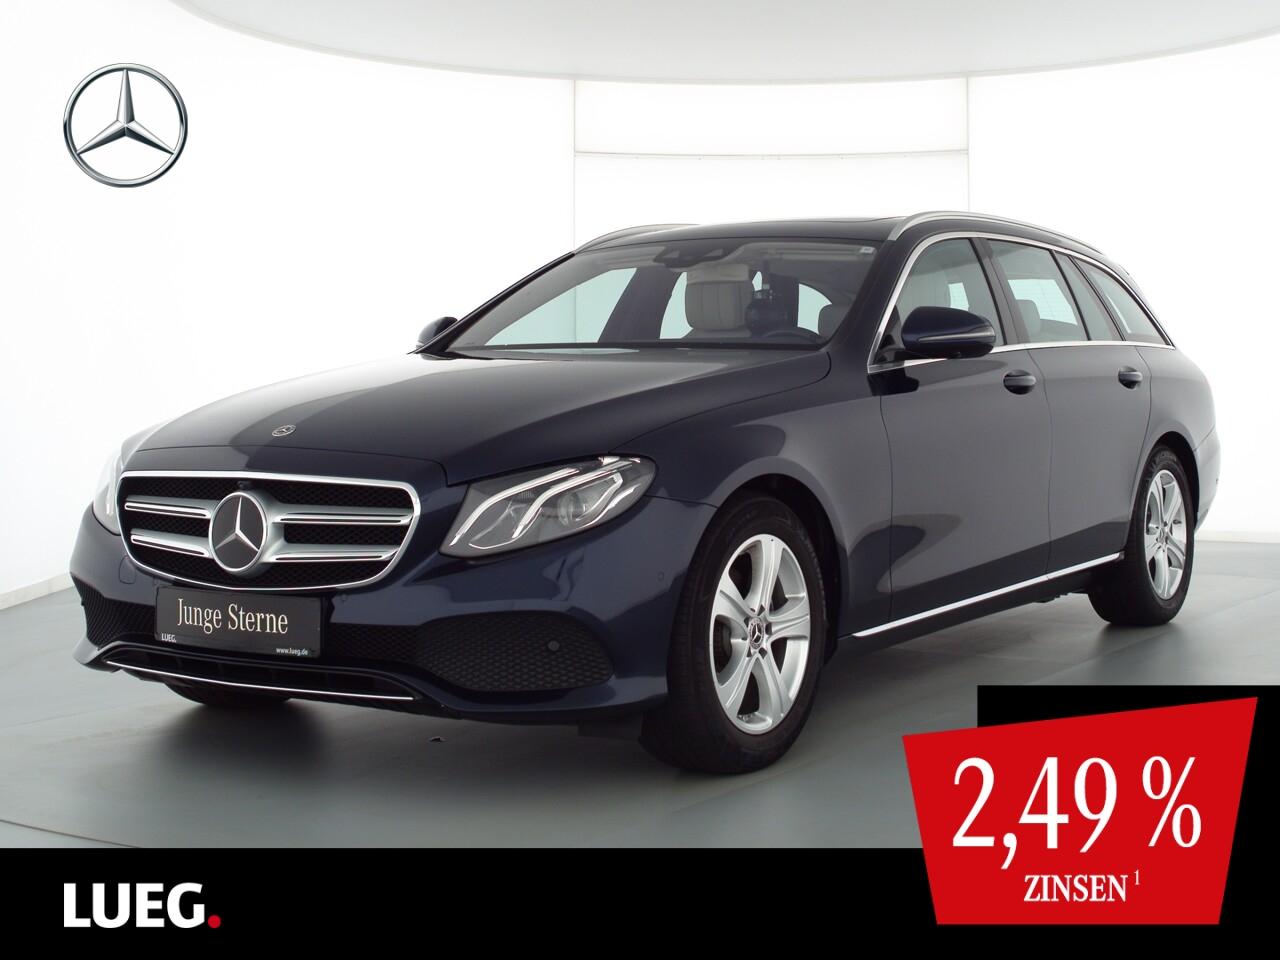 Mercedes-Benz E 220 d T Avantgarde+COM+SHD+Burm+LED+Sthzg+360°, Jahr 2017, Diesel